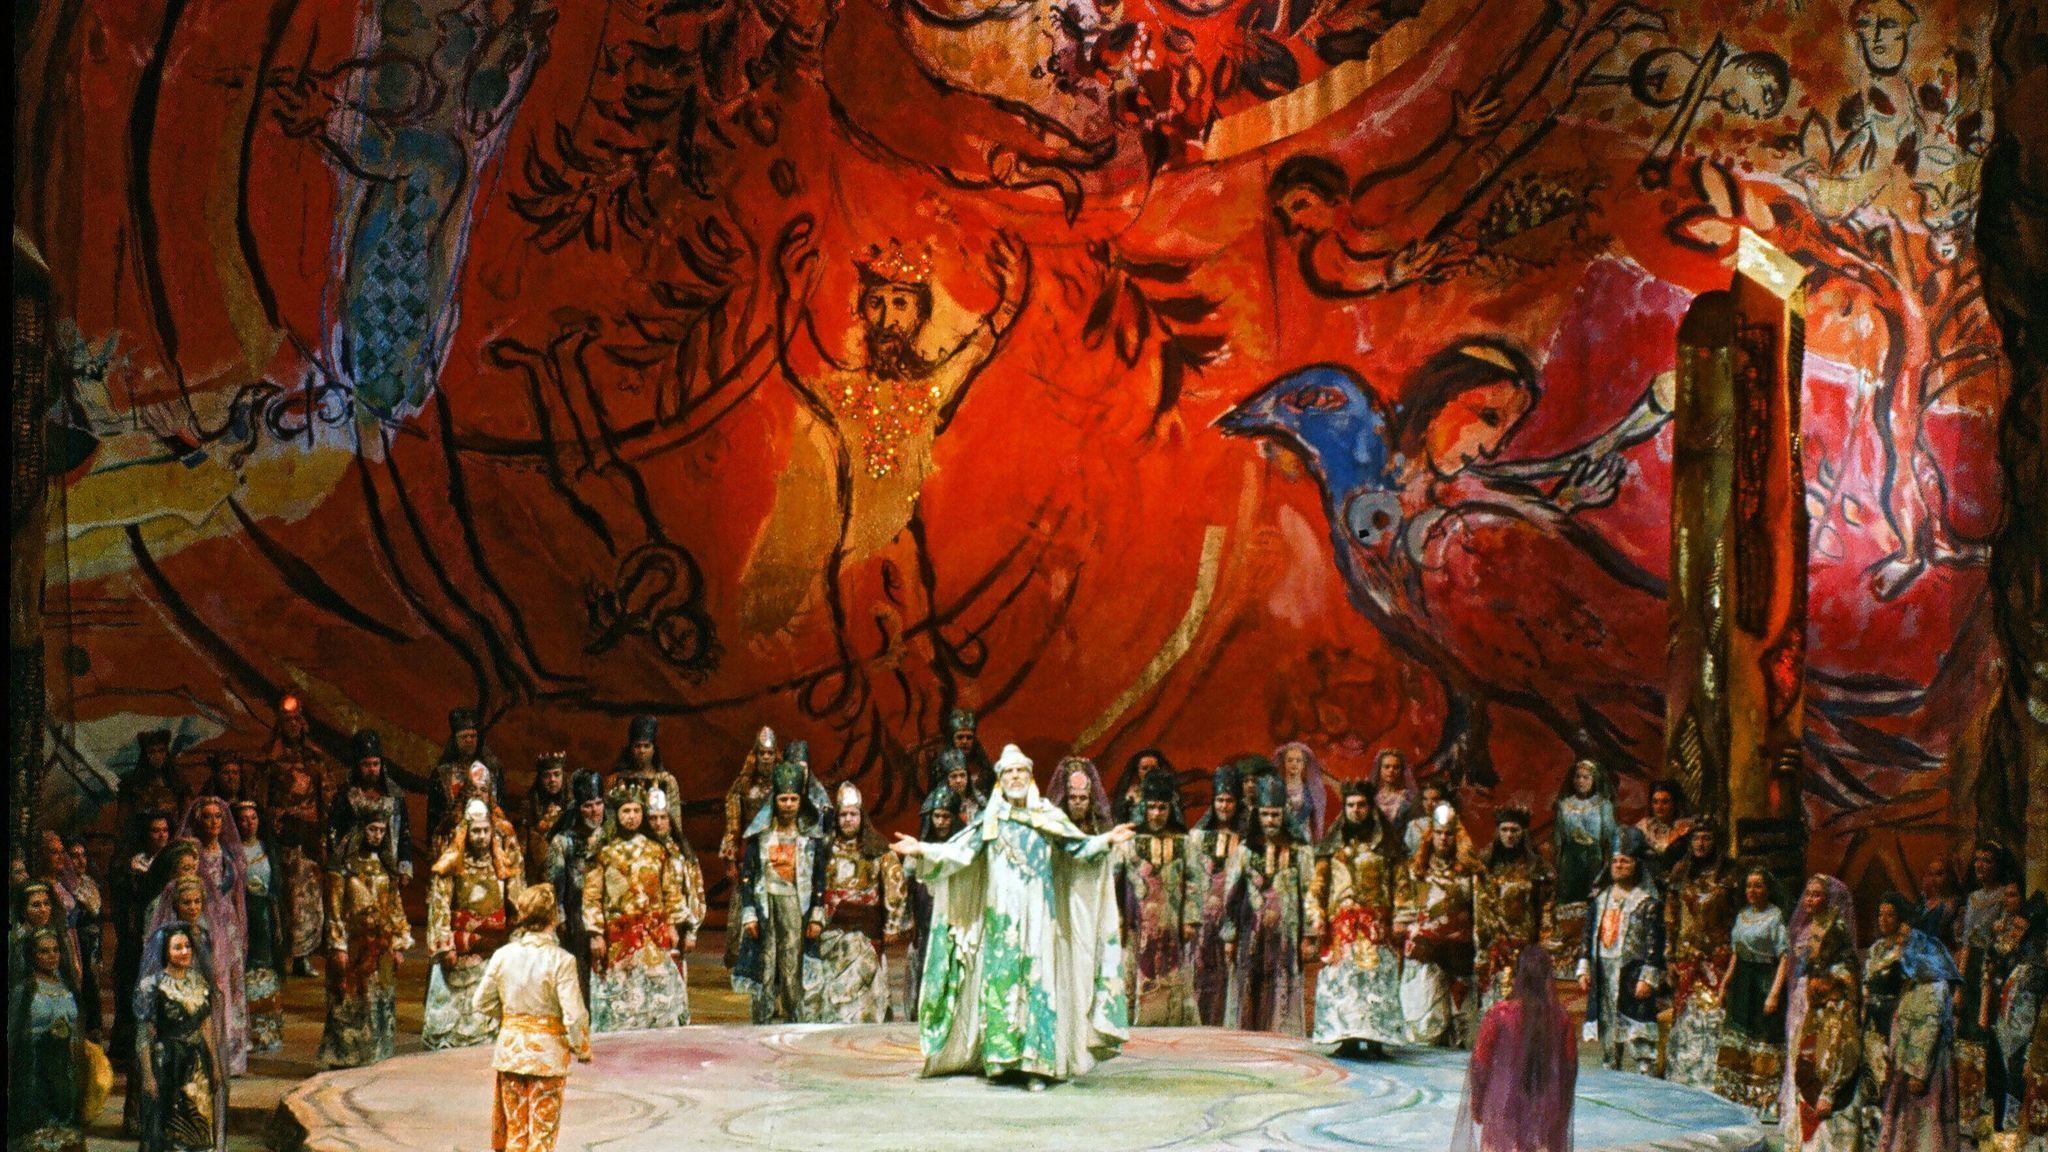 «Волшебная флейта» Моцарта на сцене Metropolitan Opera, в Нью-Йорке, 1967 / Сценография Марка Шагала / Frank Dunand / Metropolitan Opera Archives